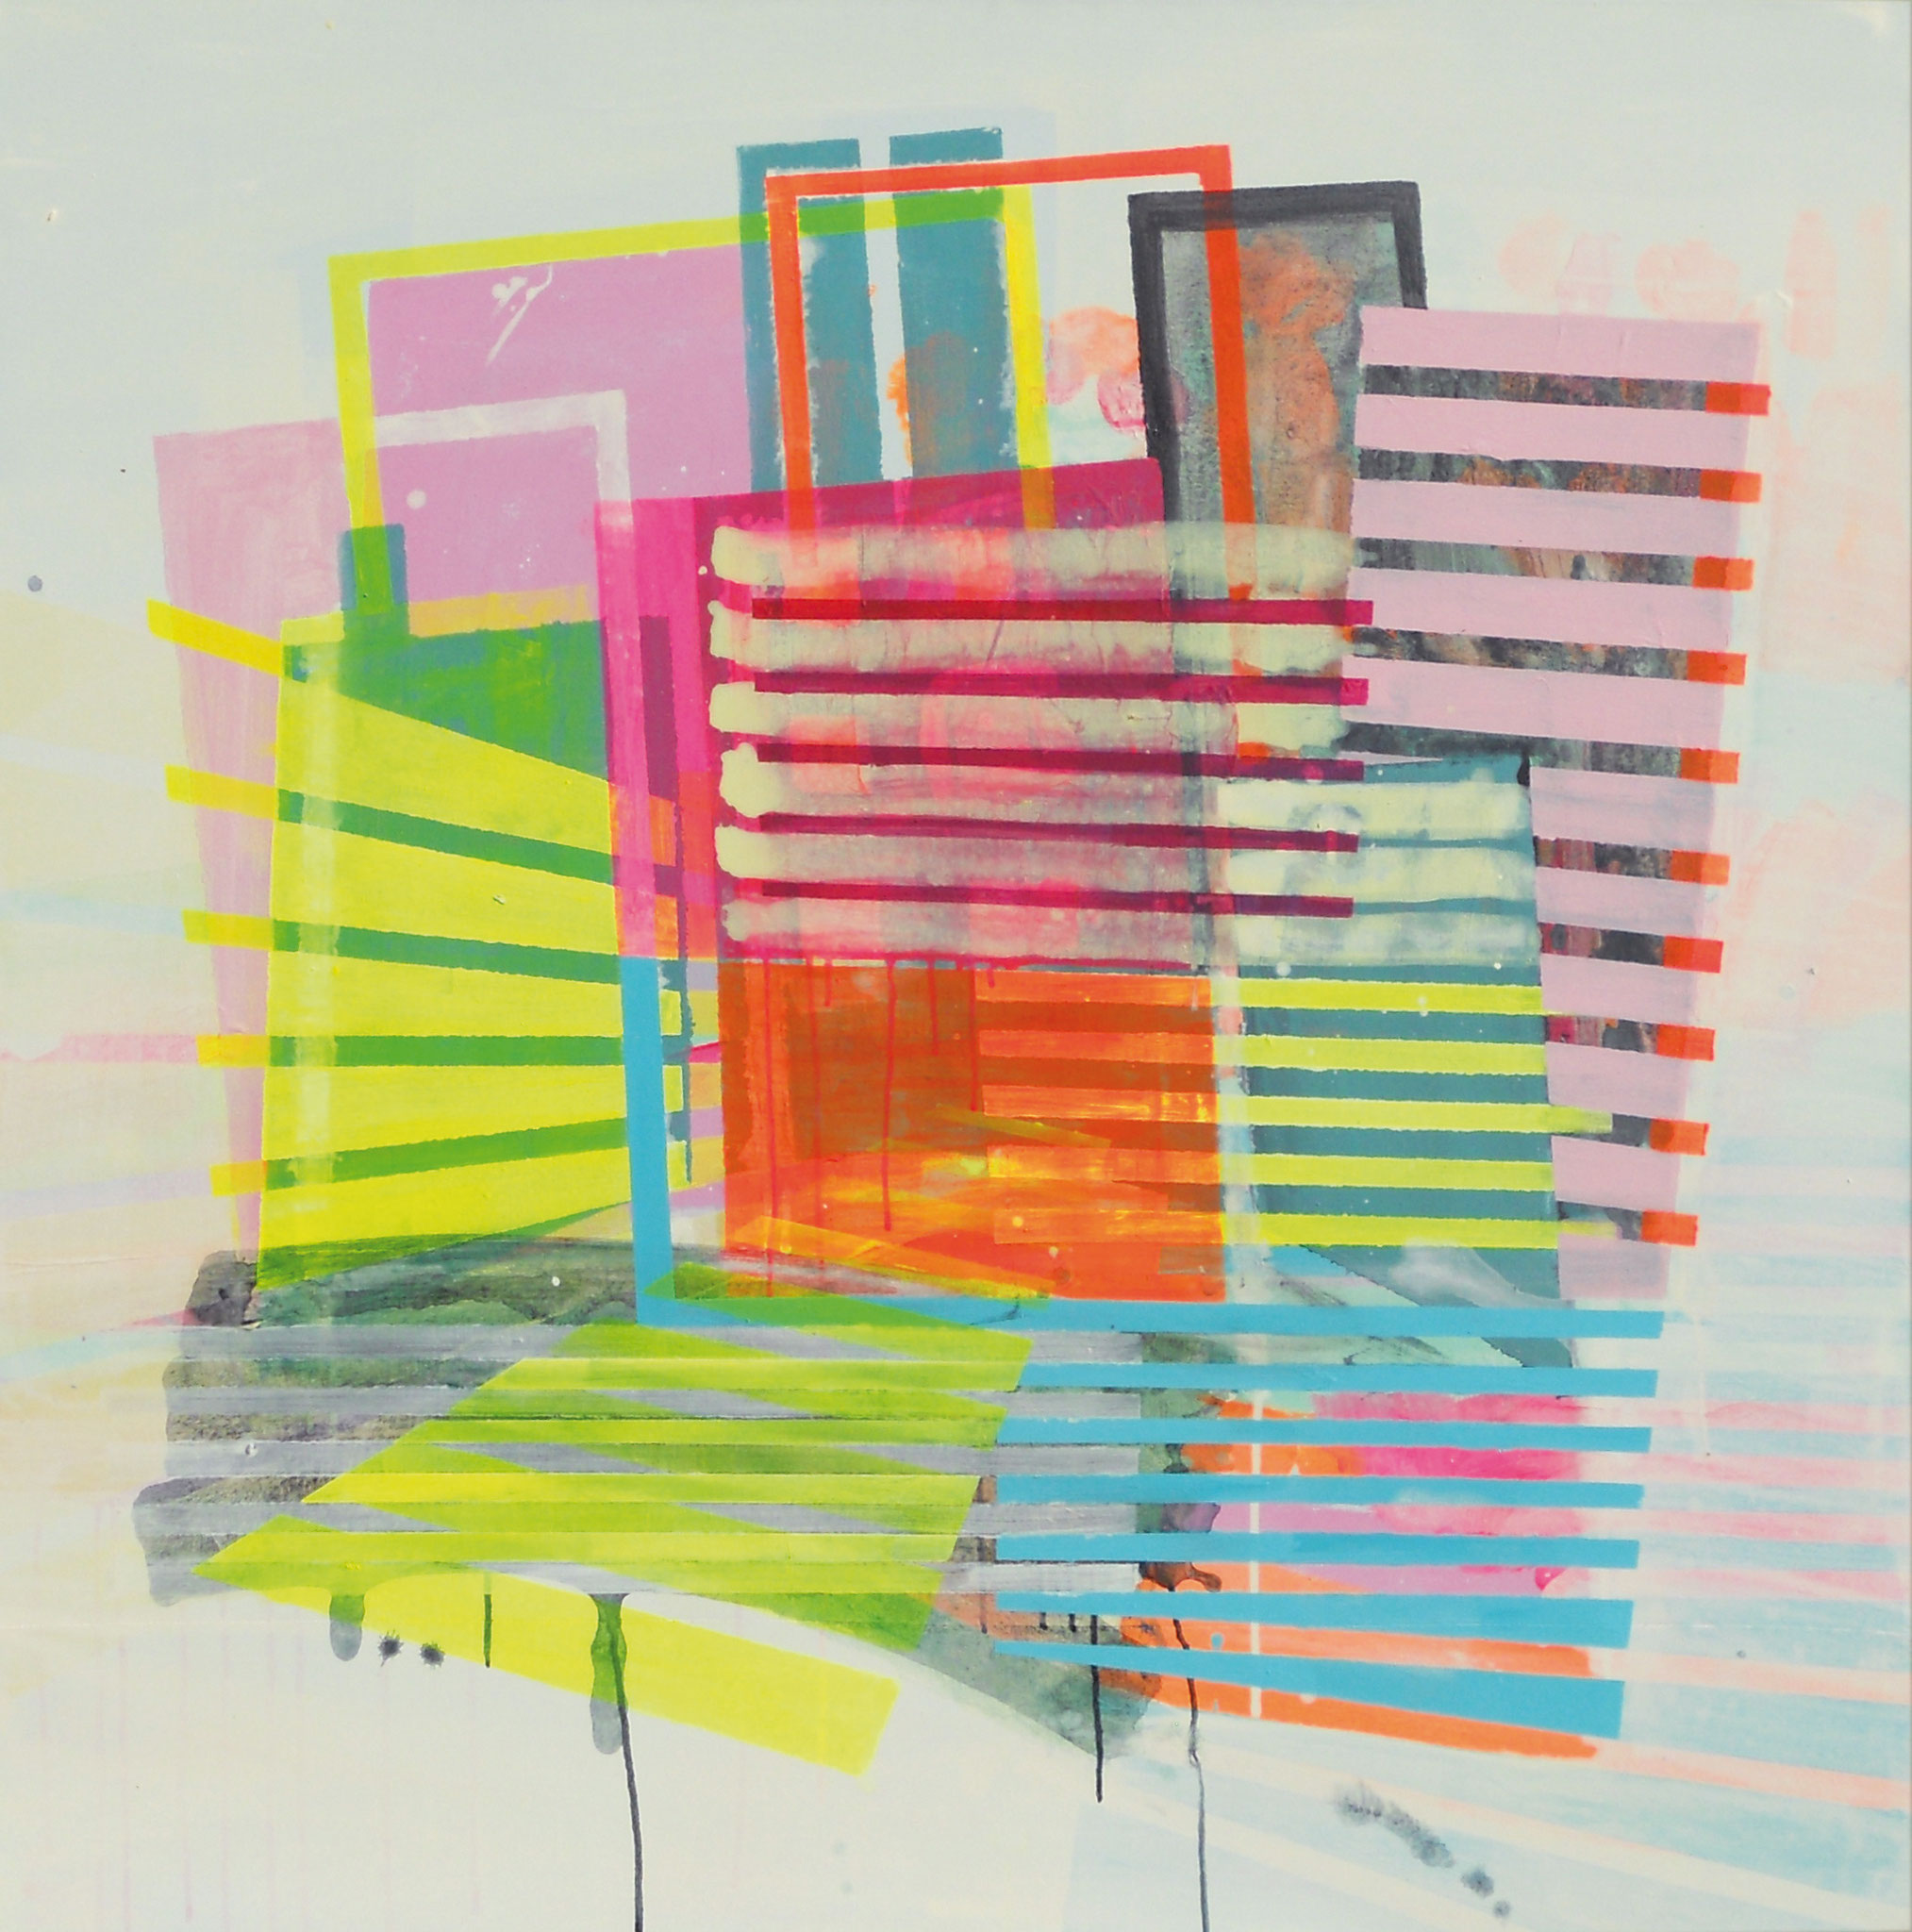 Light&Brigth 15 120x120 cm  2019 Pigmente/Binder auf Leinwand